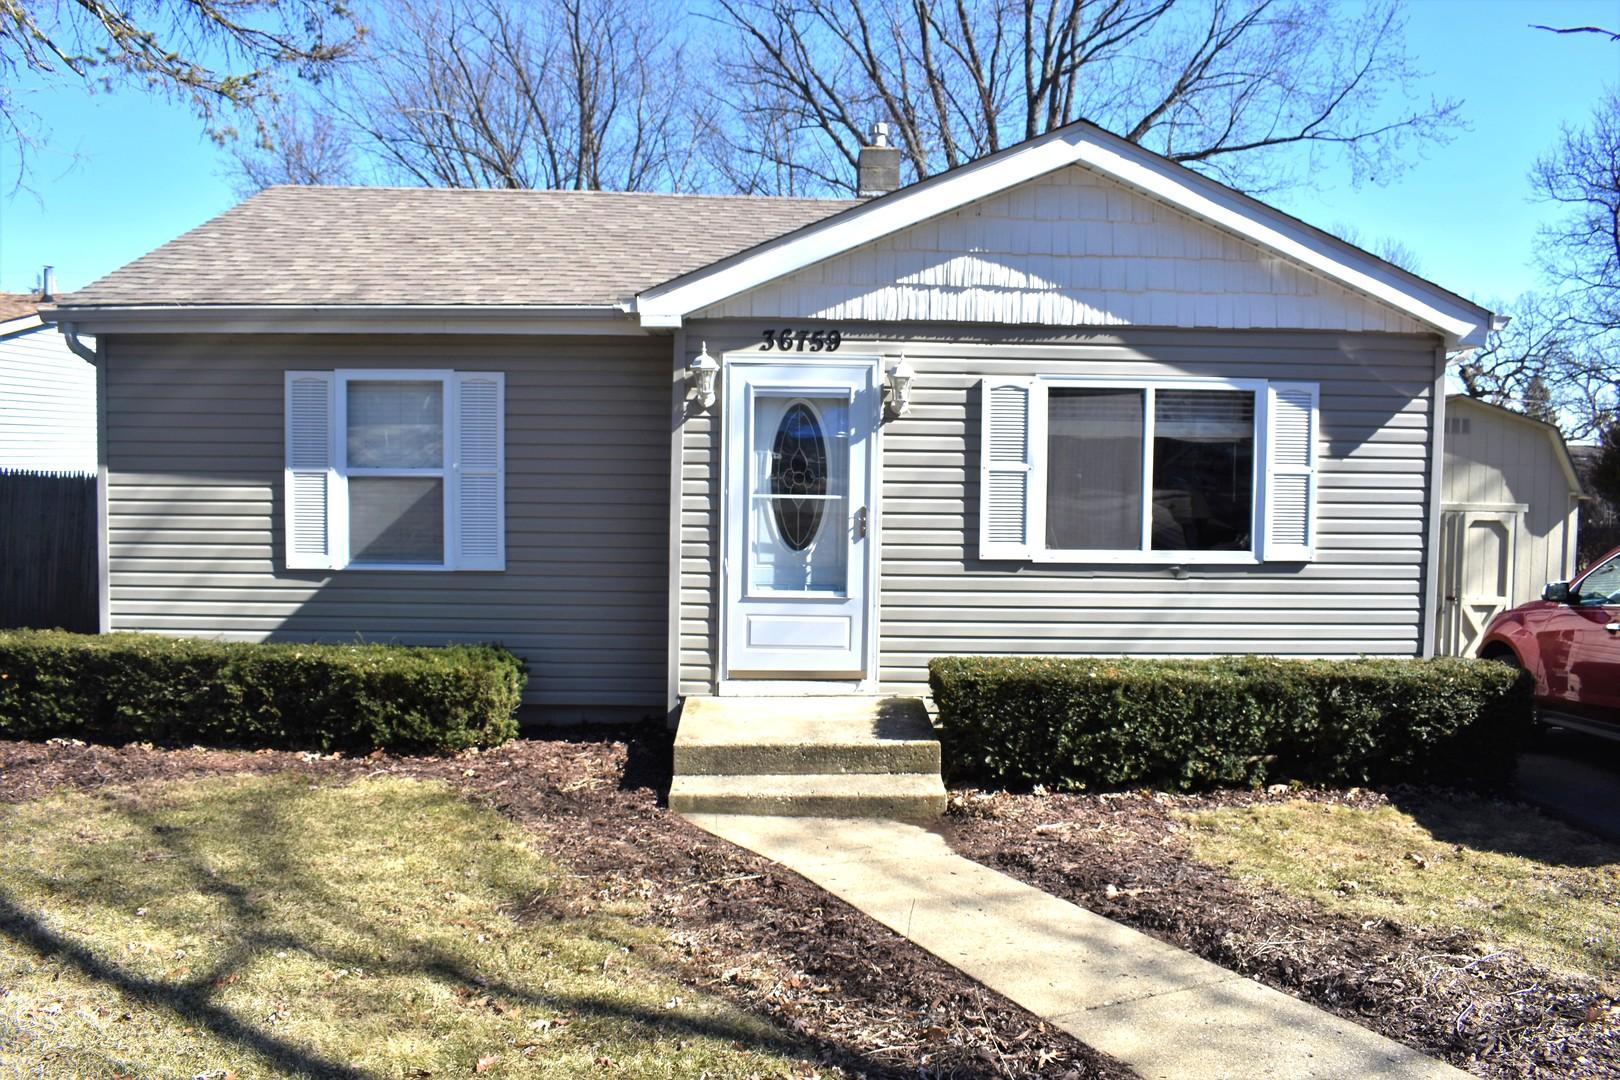 36759 North Wildwood Drive, Lake Villa, Illinois 60046